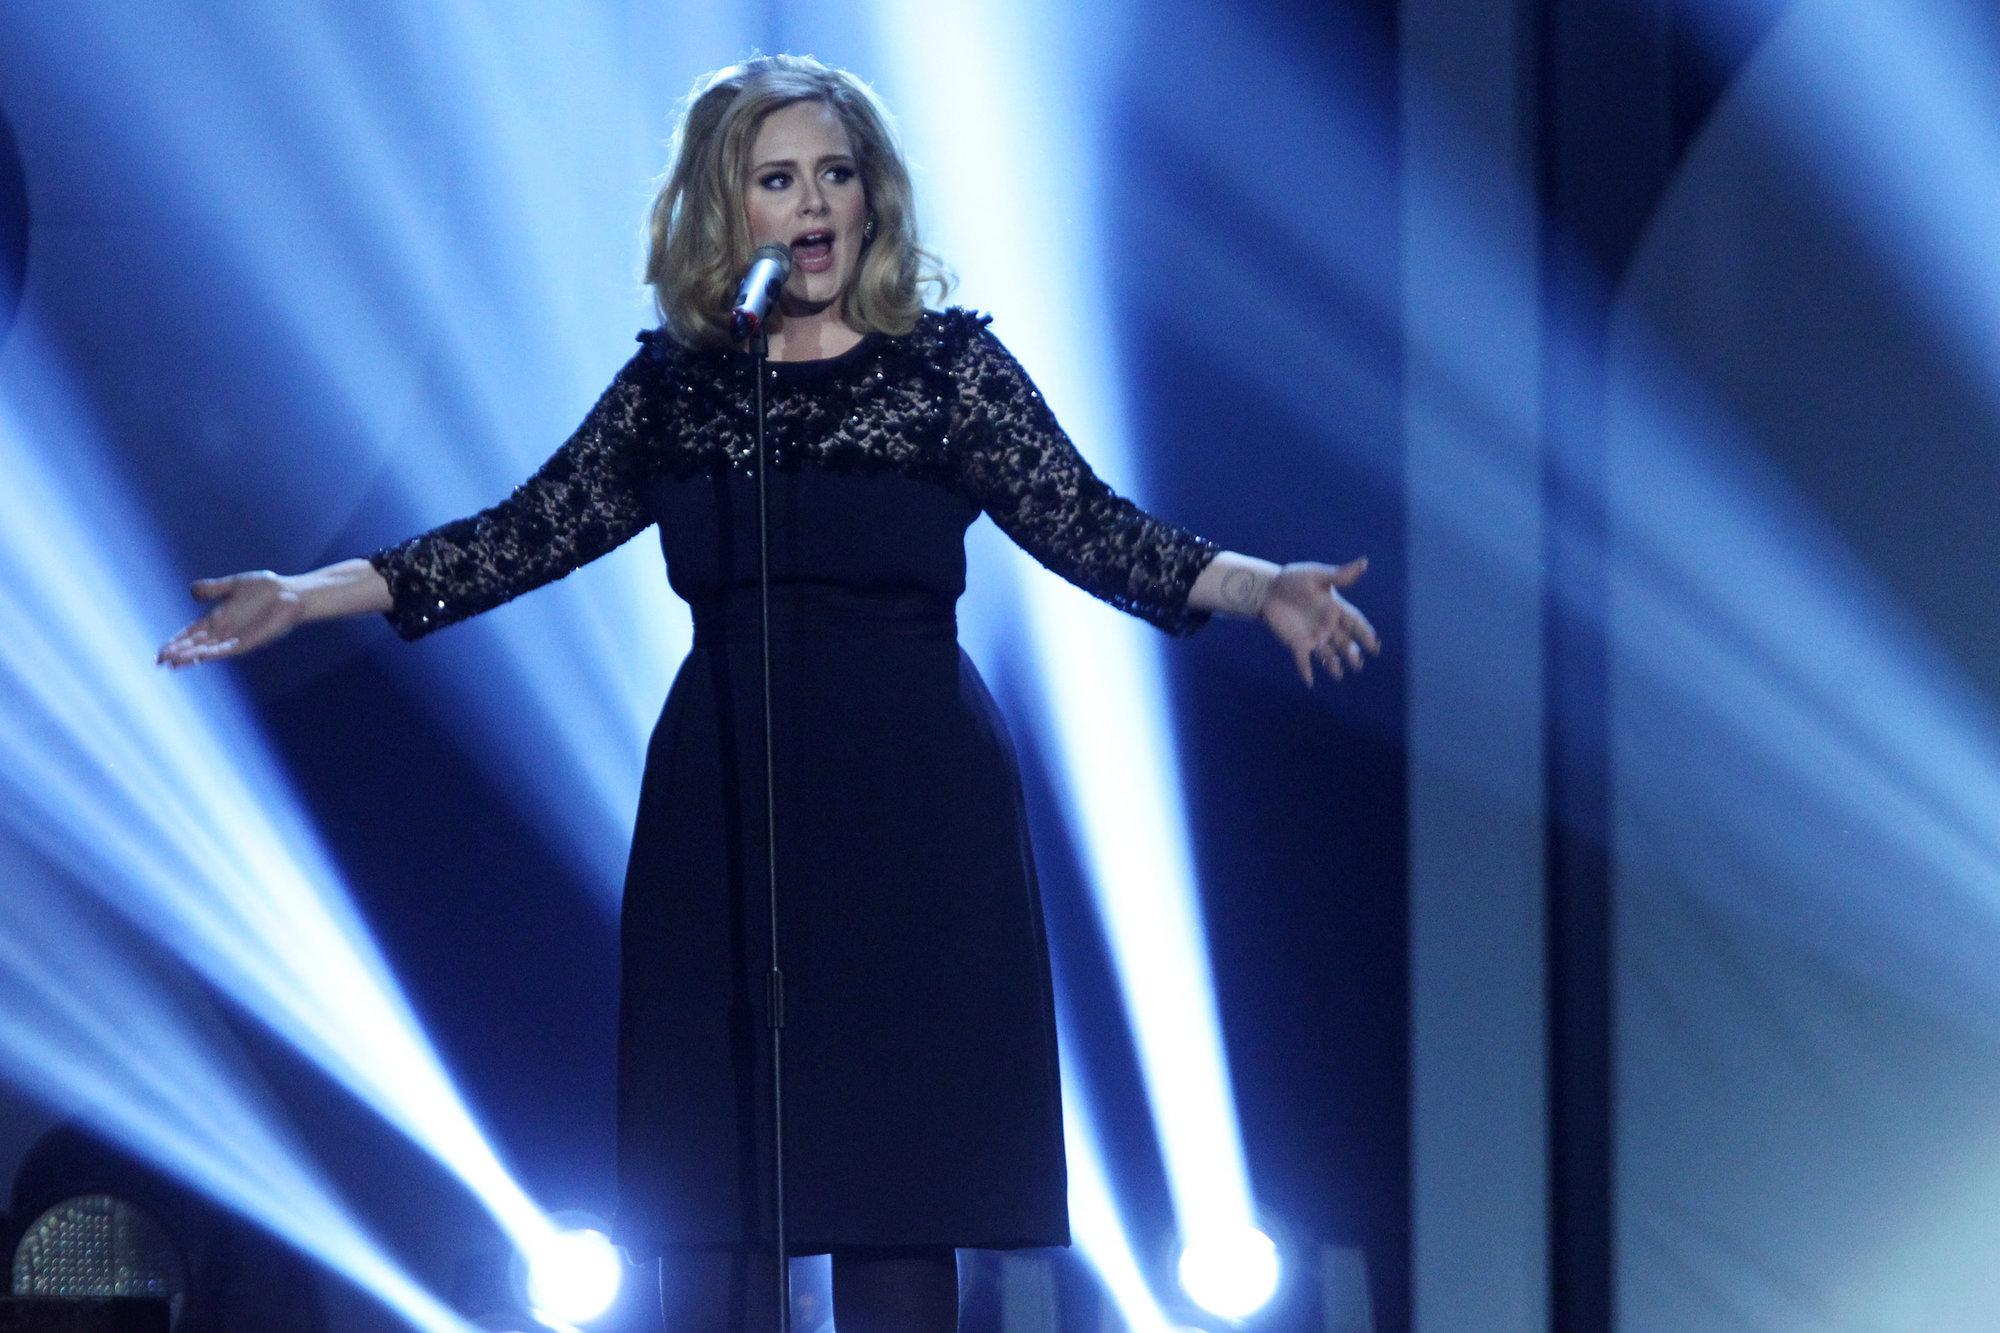 Adele está a régimen, ya ha adelgazado seis kilos gracias a una dieta vegetariana